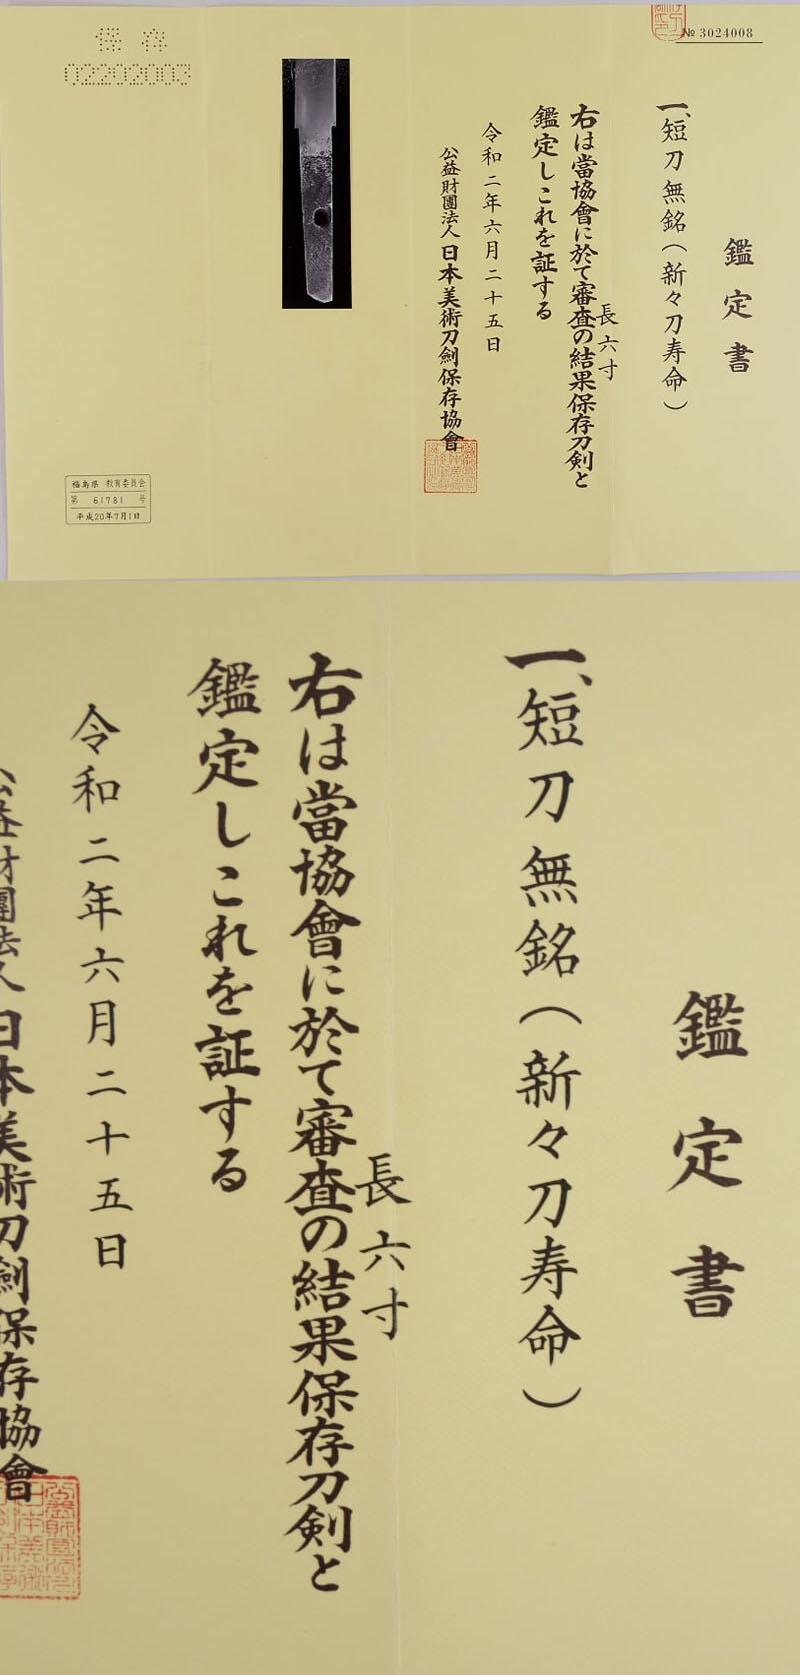 短刀 無名(新々刀寿命) Picture of Certificate